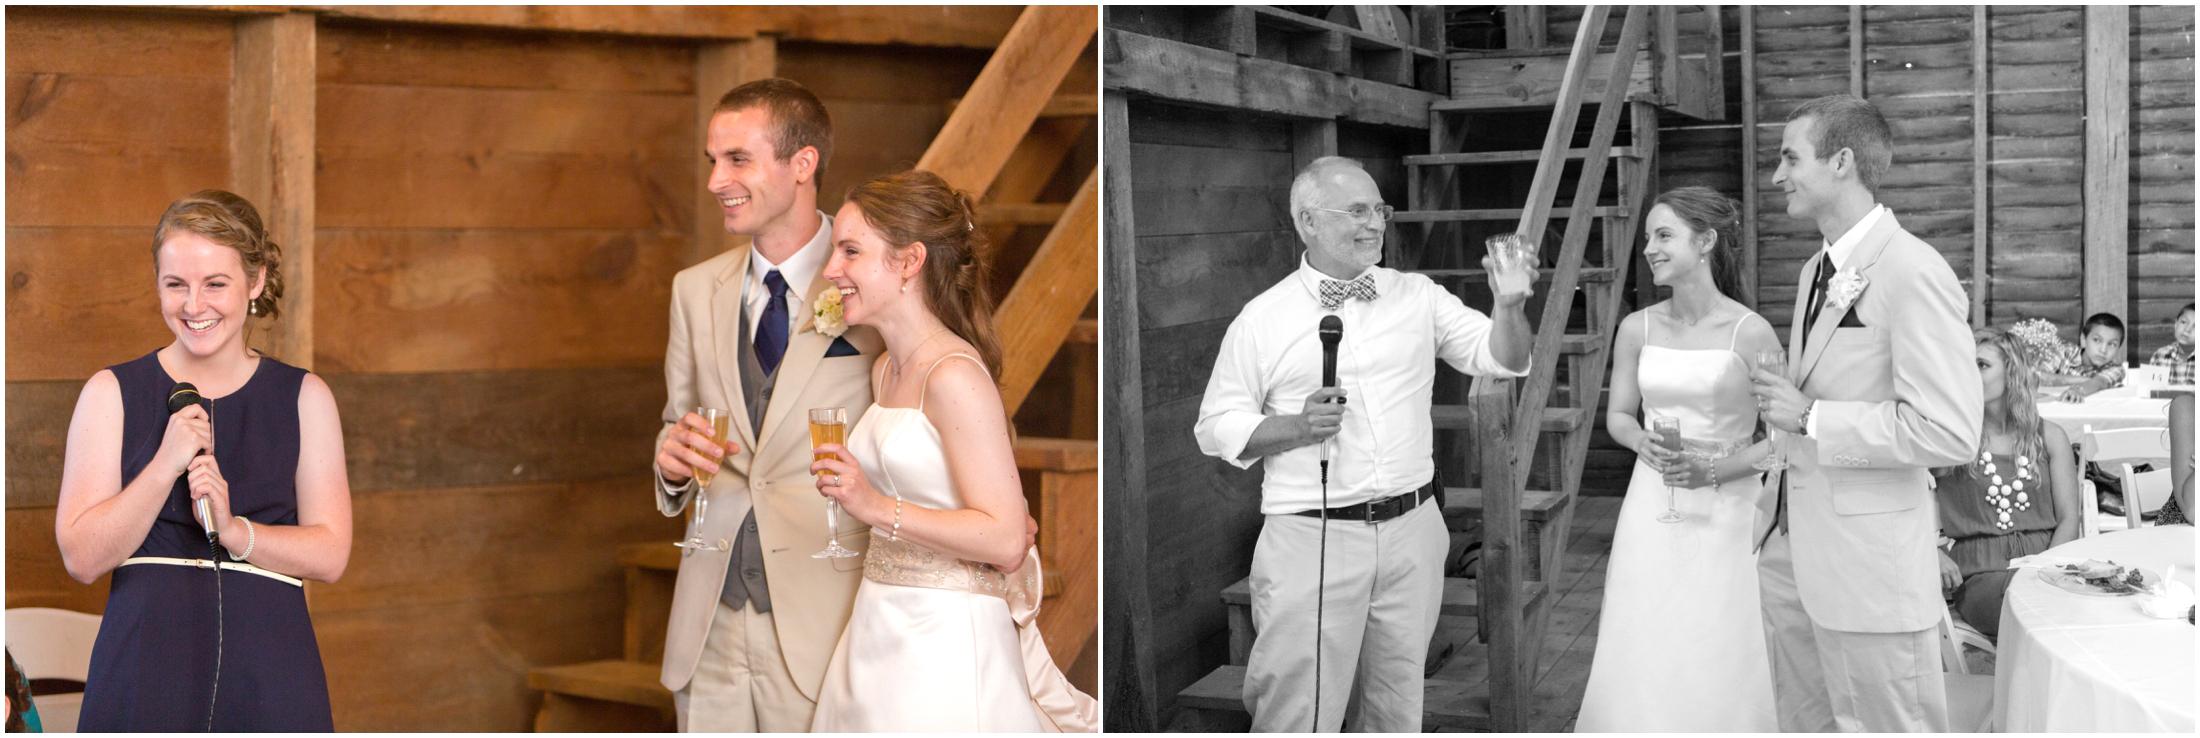 Nash-Wedding-Reception-1141.jpg